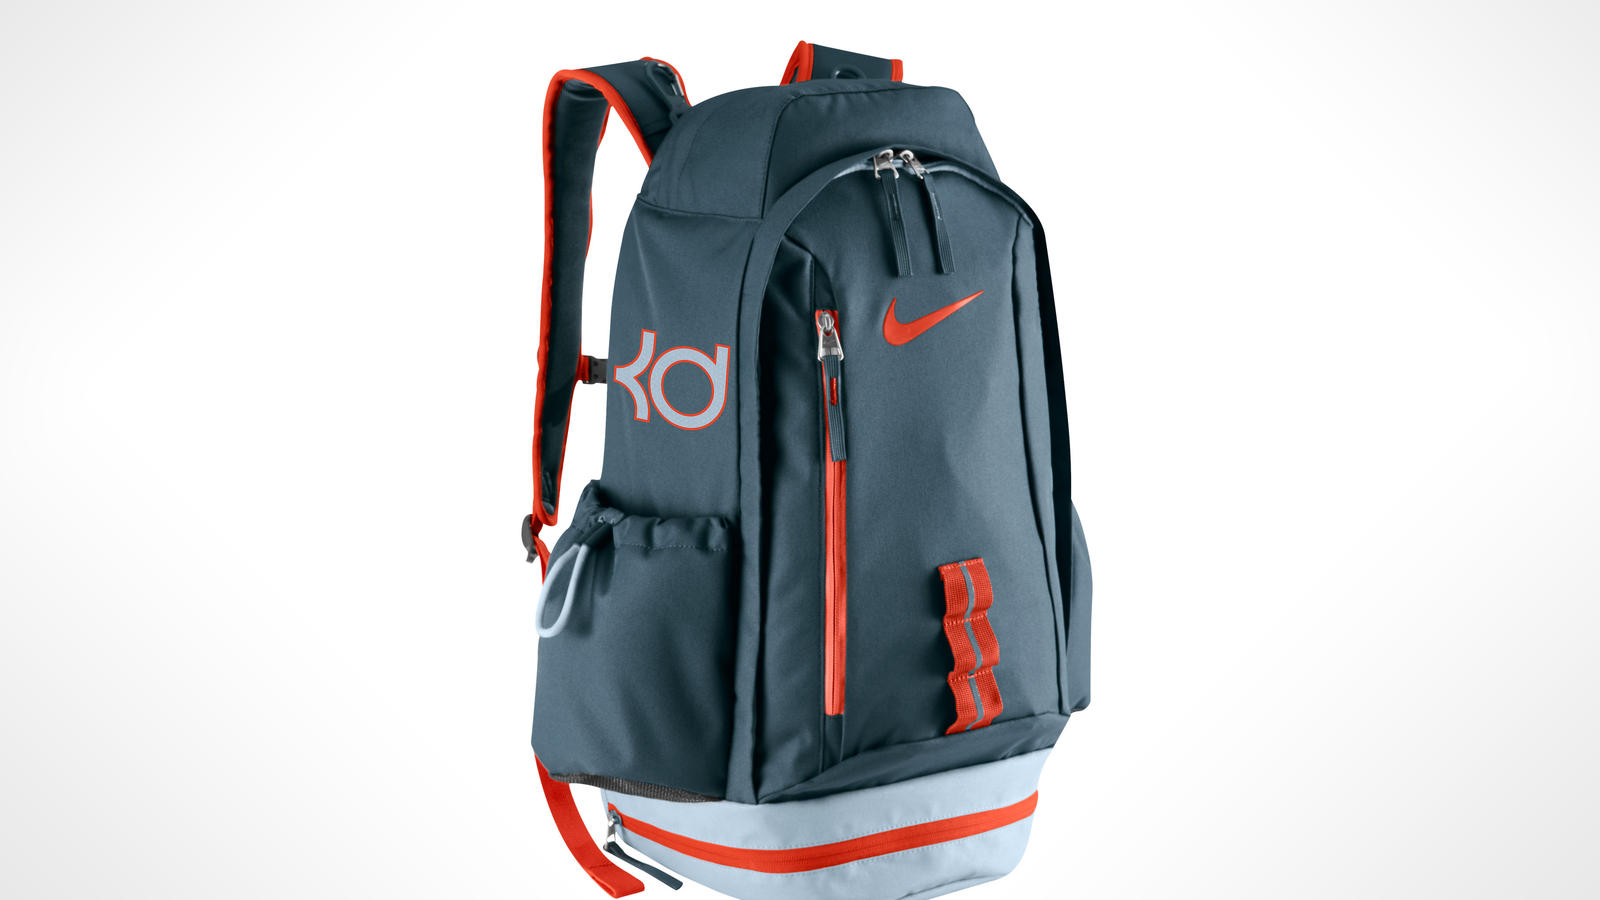 kd-backpack-1